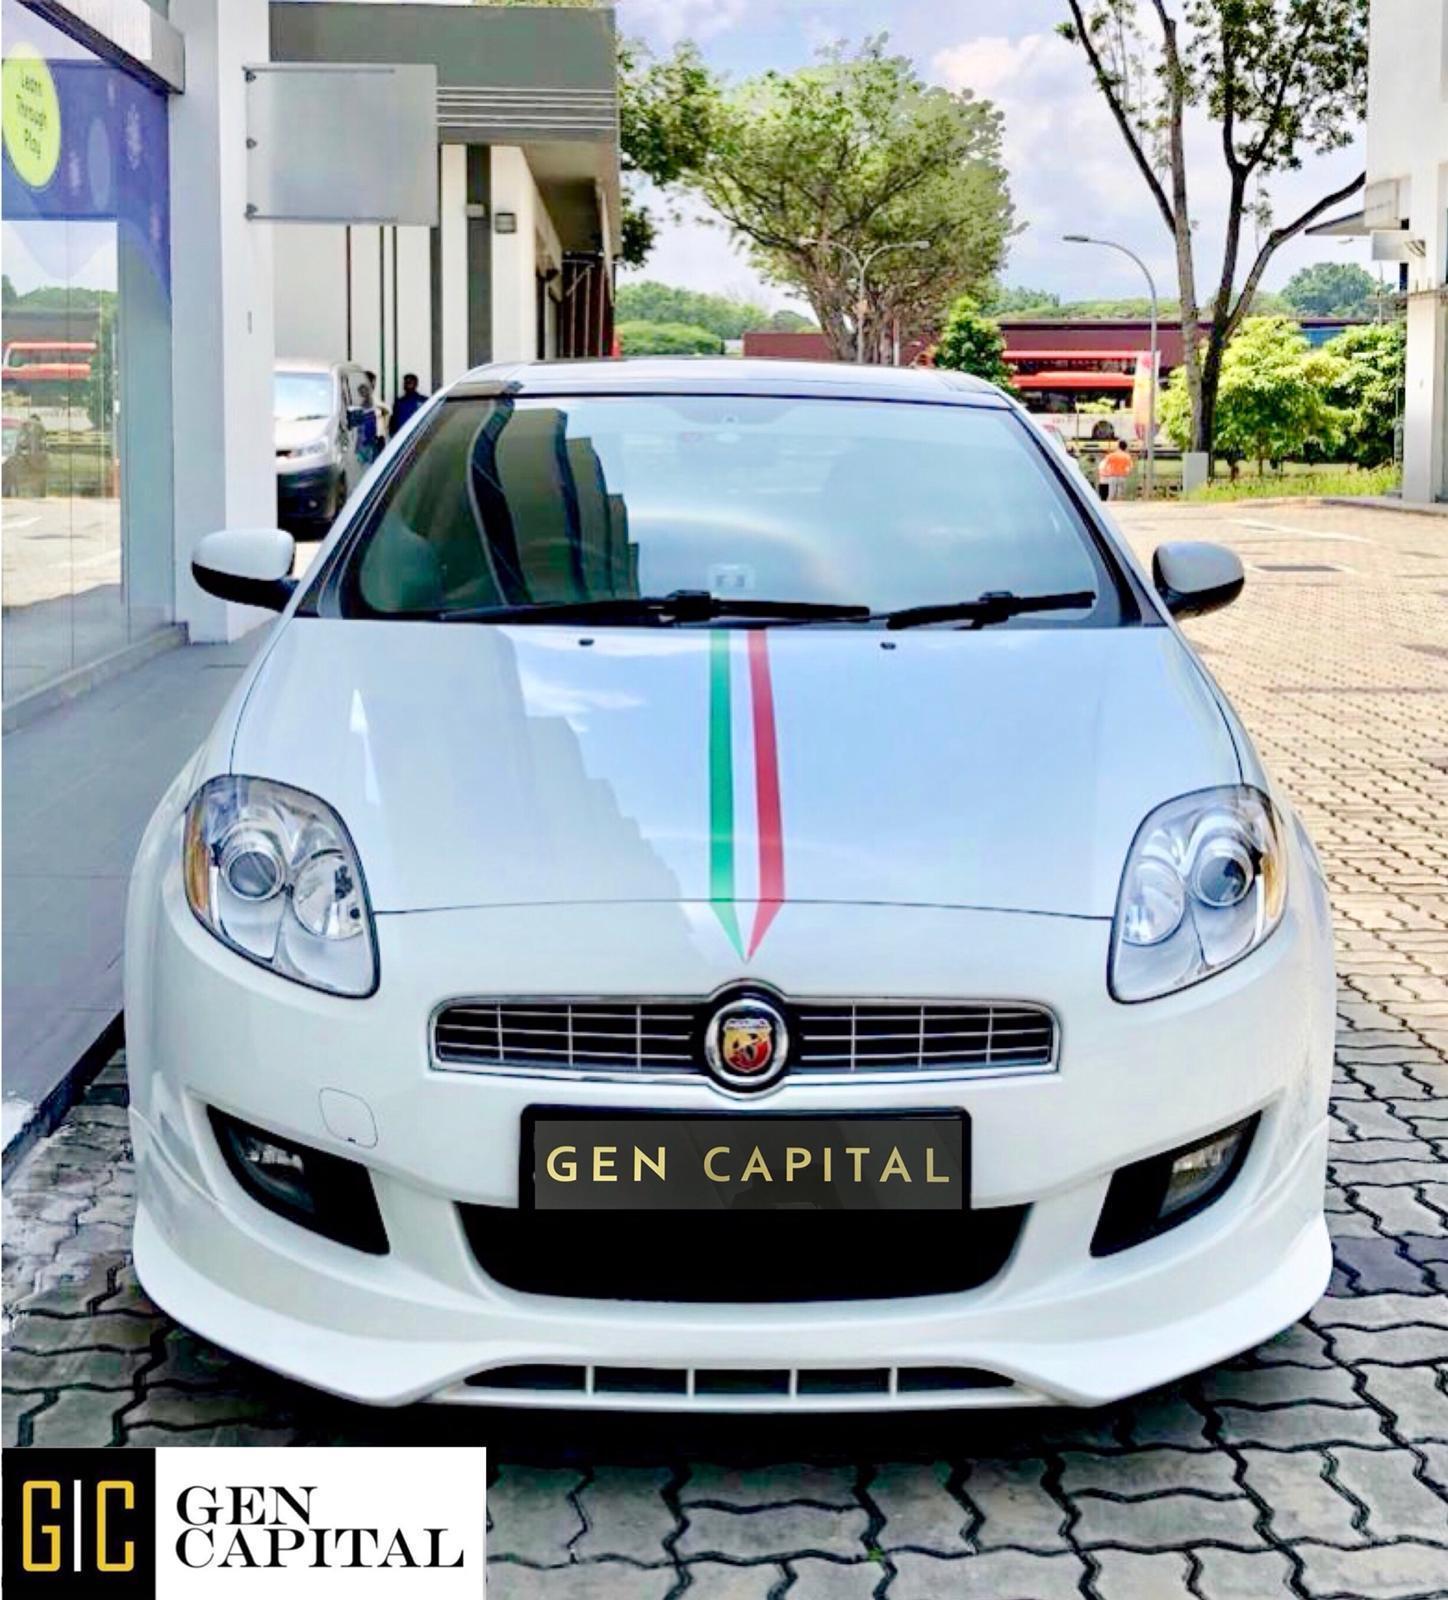 Fiat Bravo 1.4 Turbo Grab Gojek Ryde Tada Friendly & Non PHV Car Rental